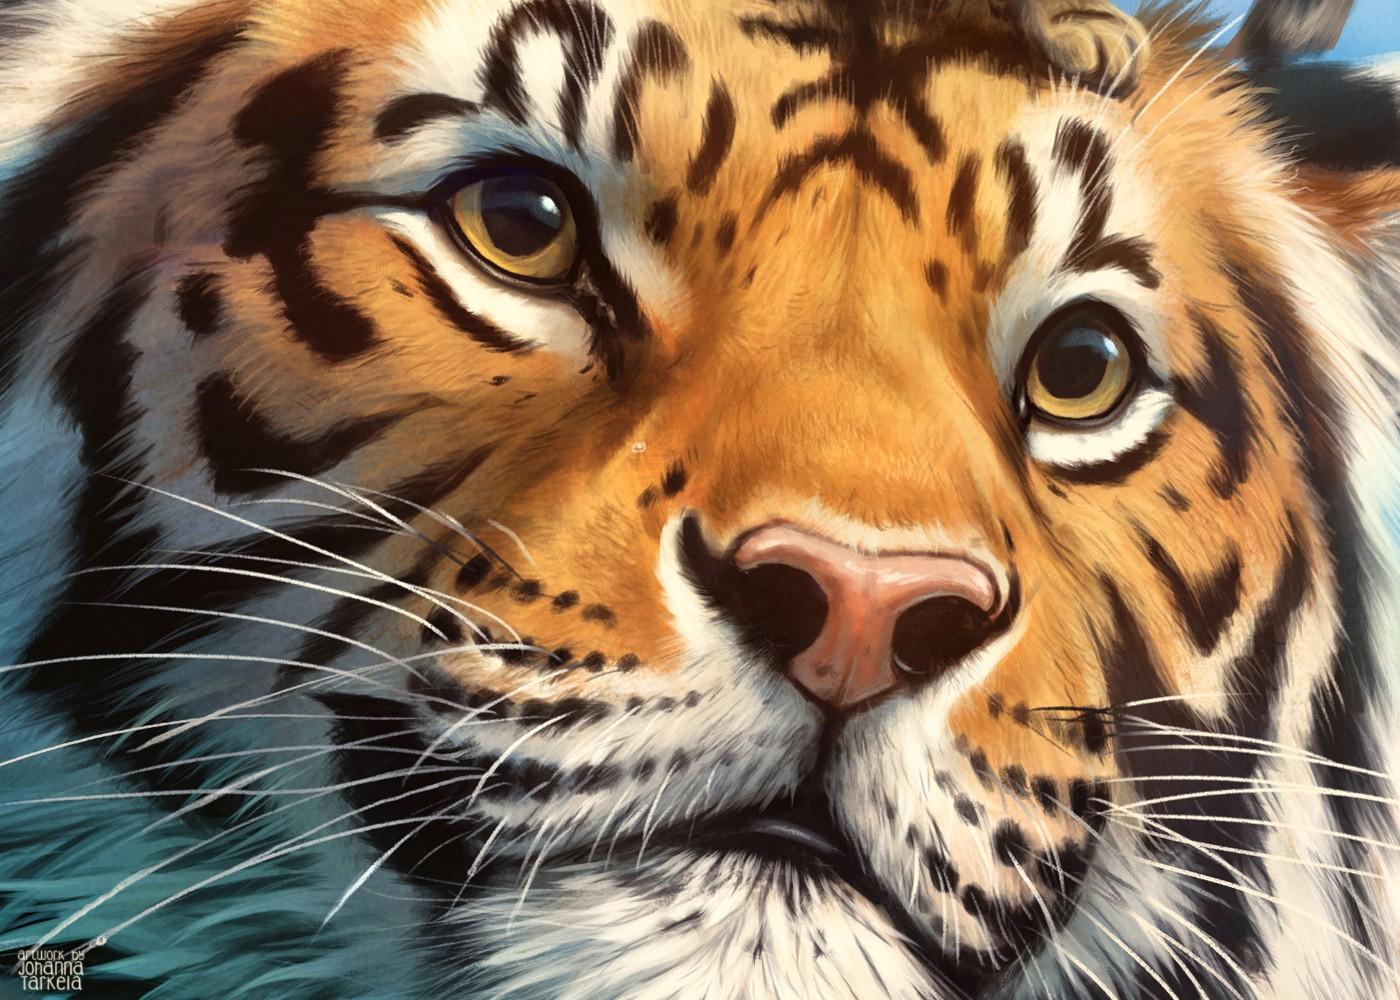 Tigercat_detail2